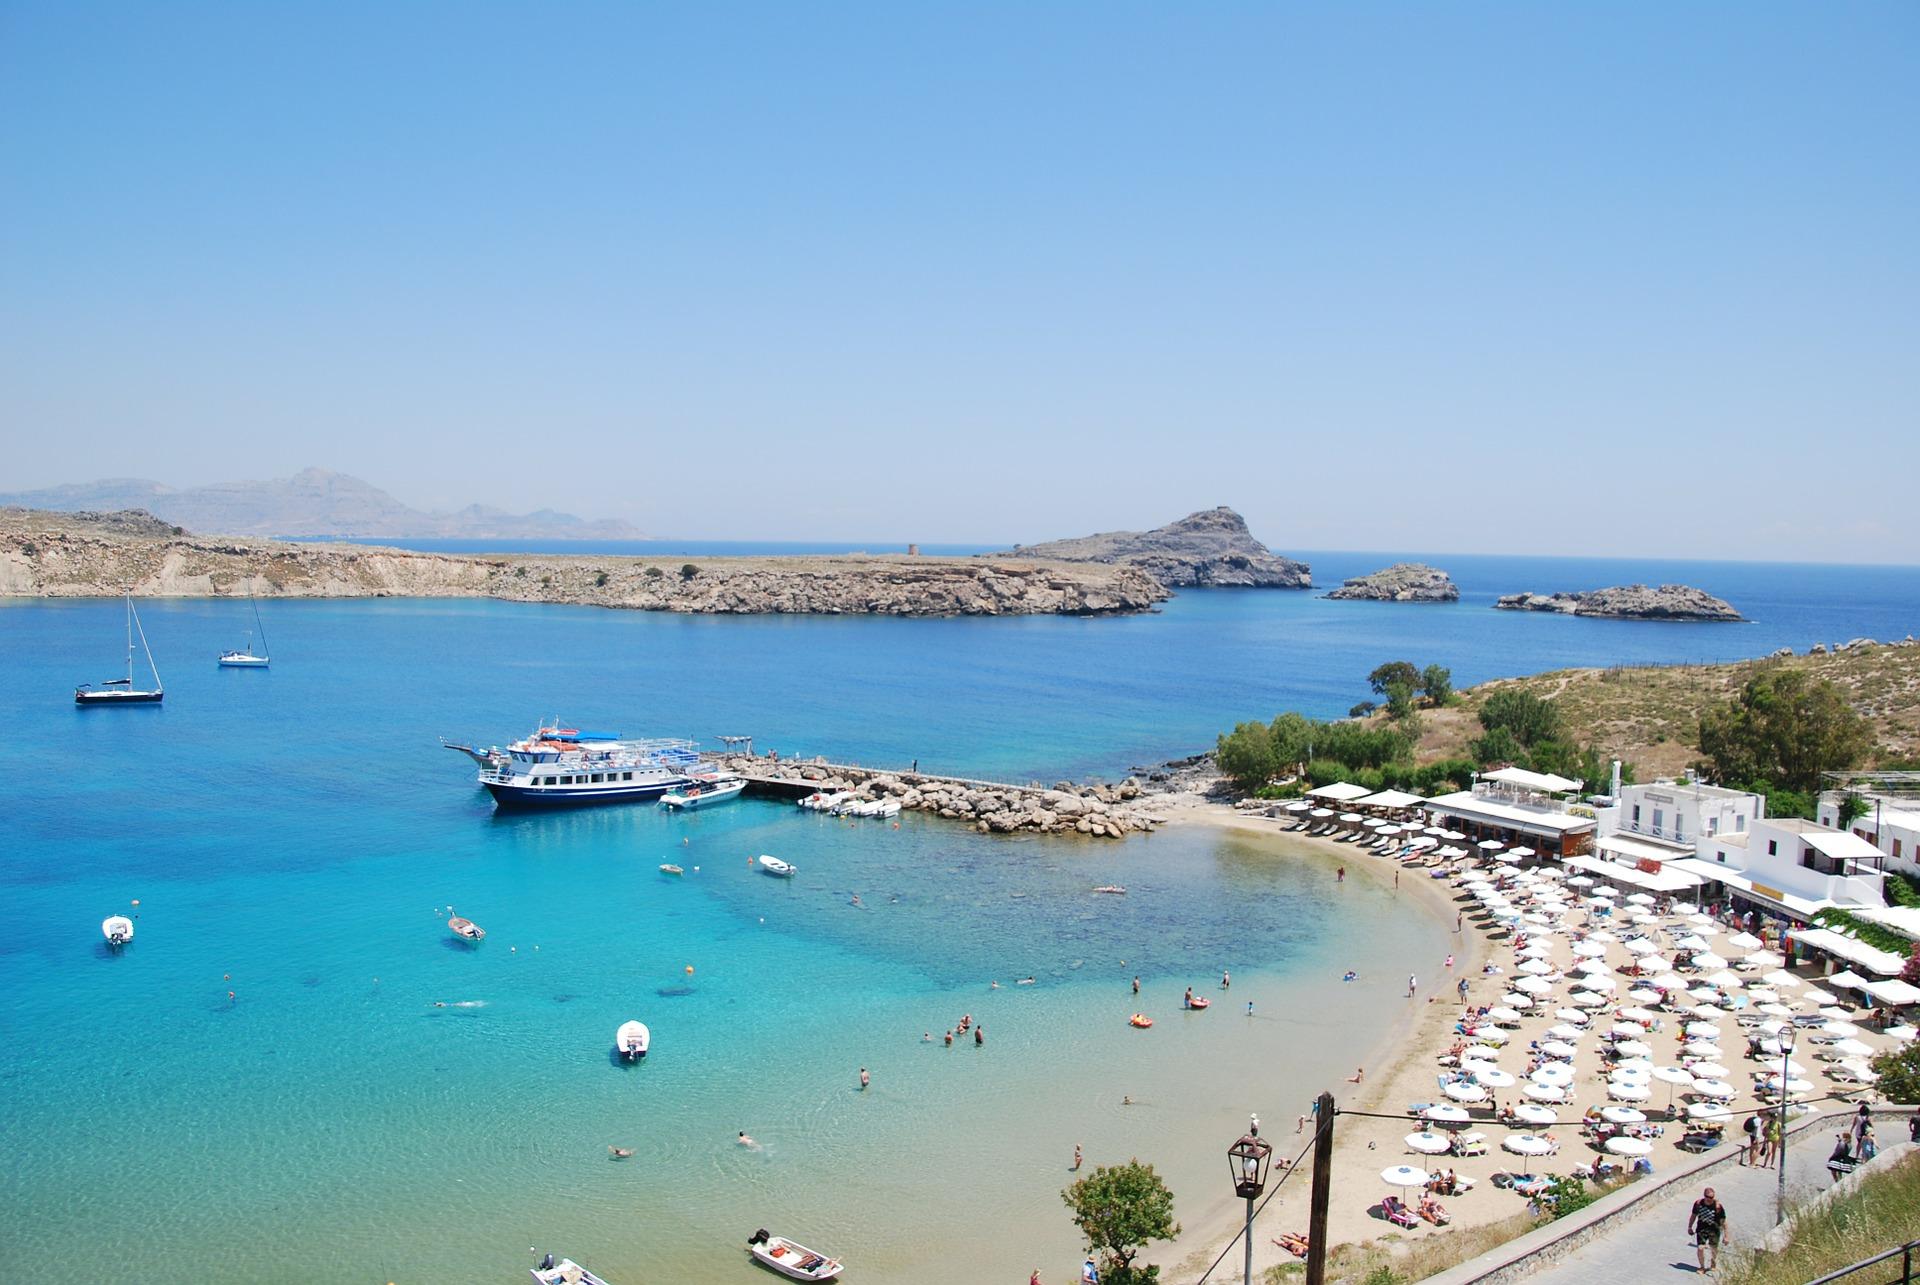 Rhodos Urlaub in Griechenland günstig ab 154,75€